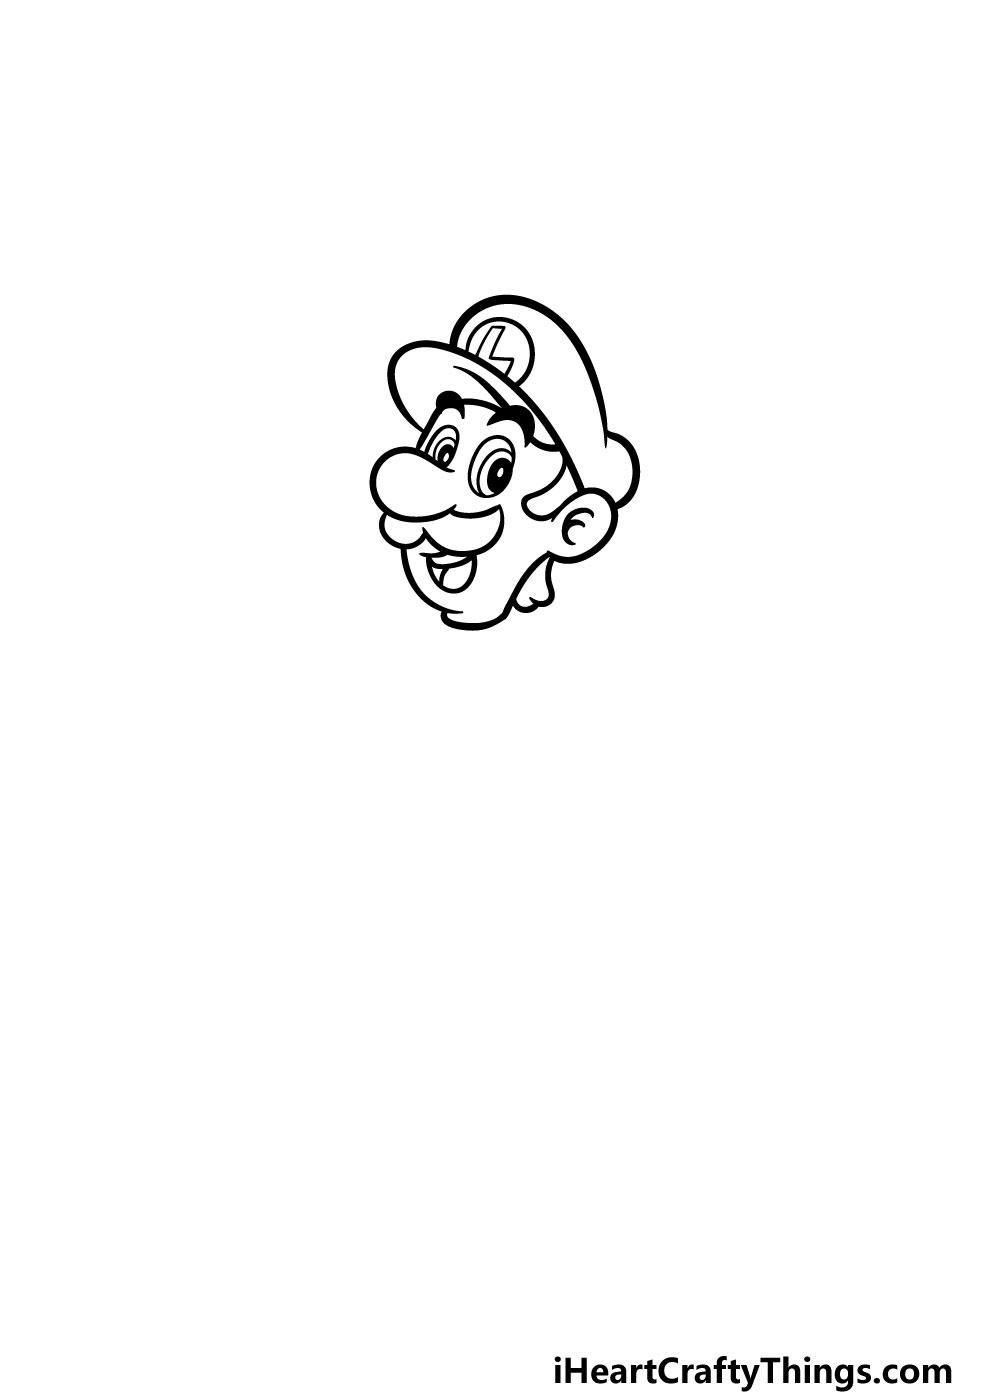 drawing luigi step 2